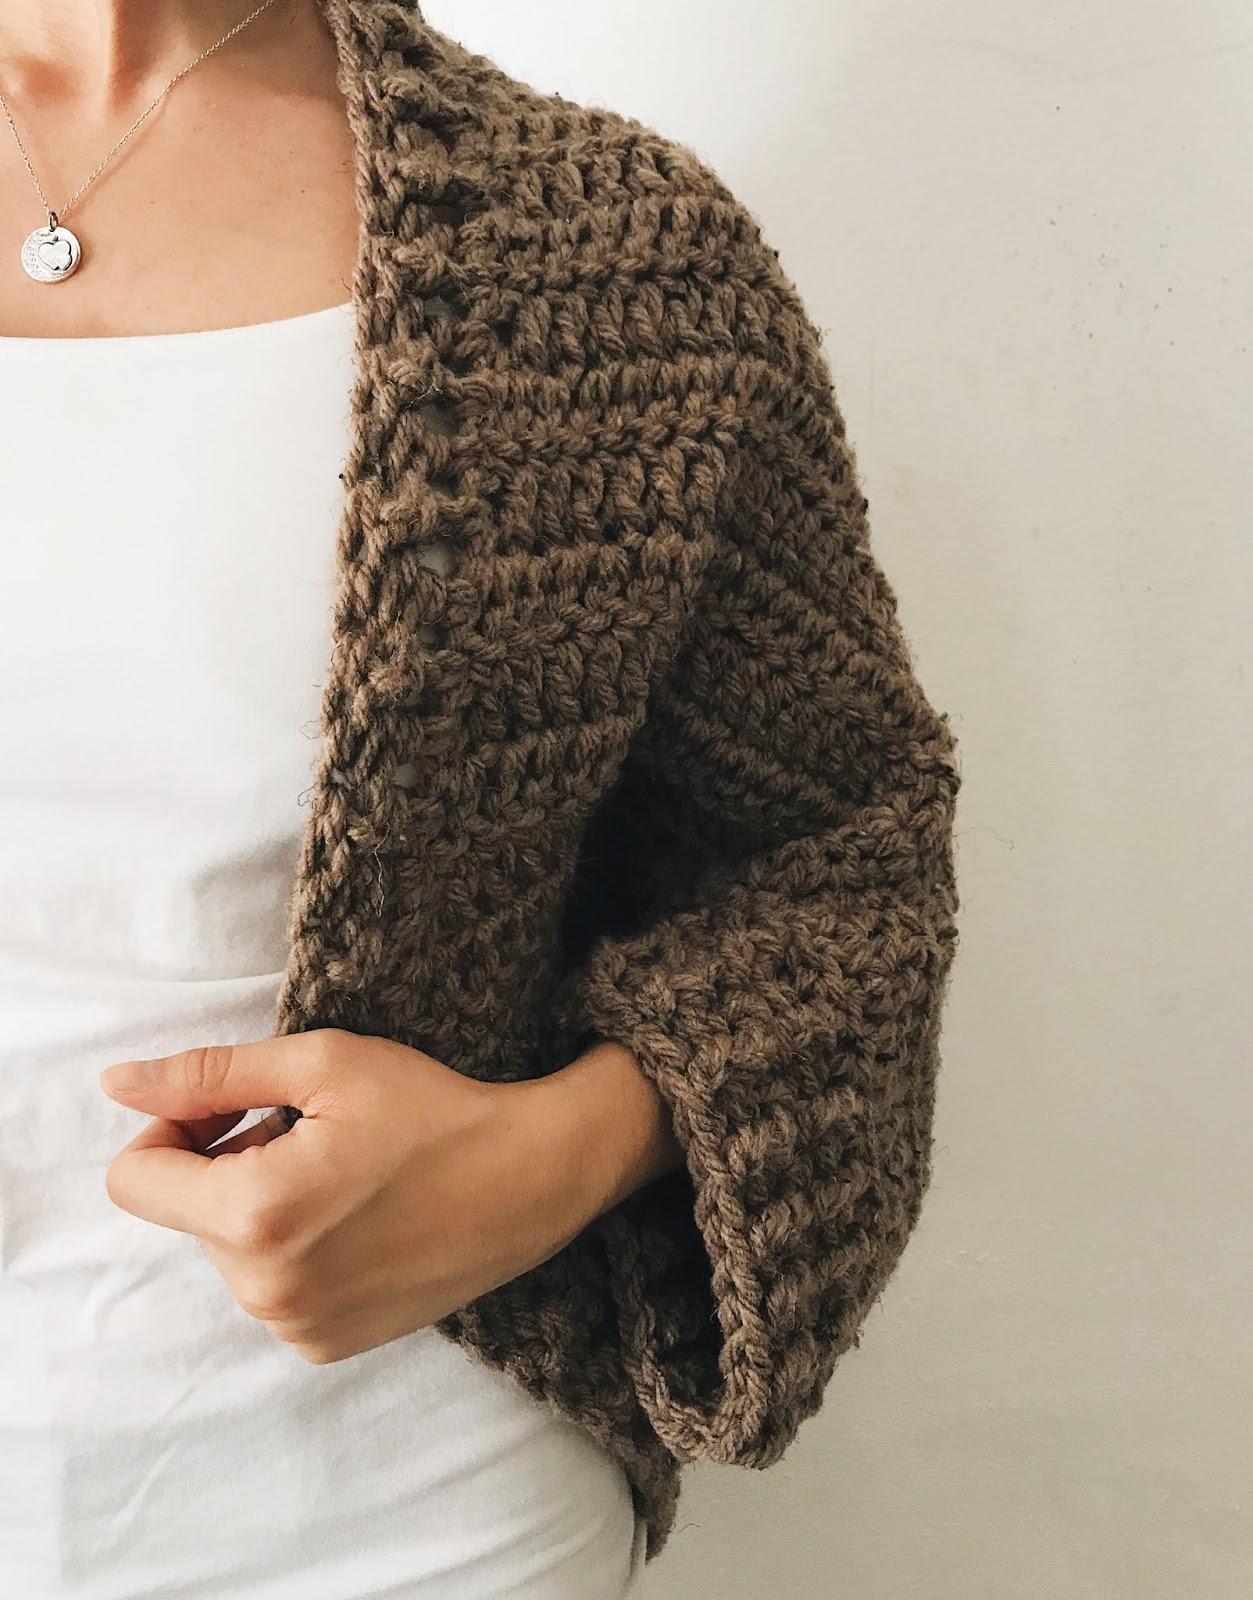 Brenna Ann Handmade Free Crochet Pattern The Simple Chunky